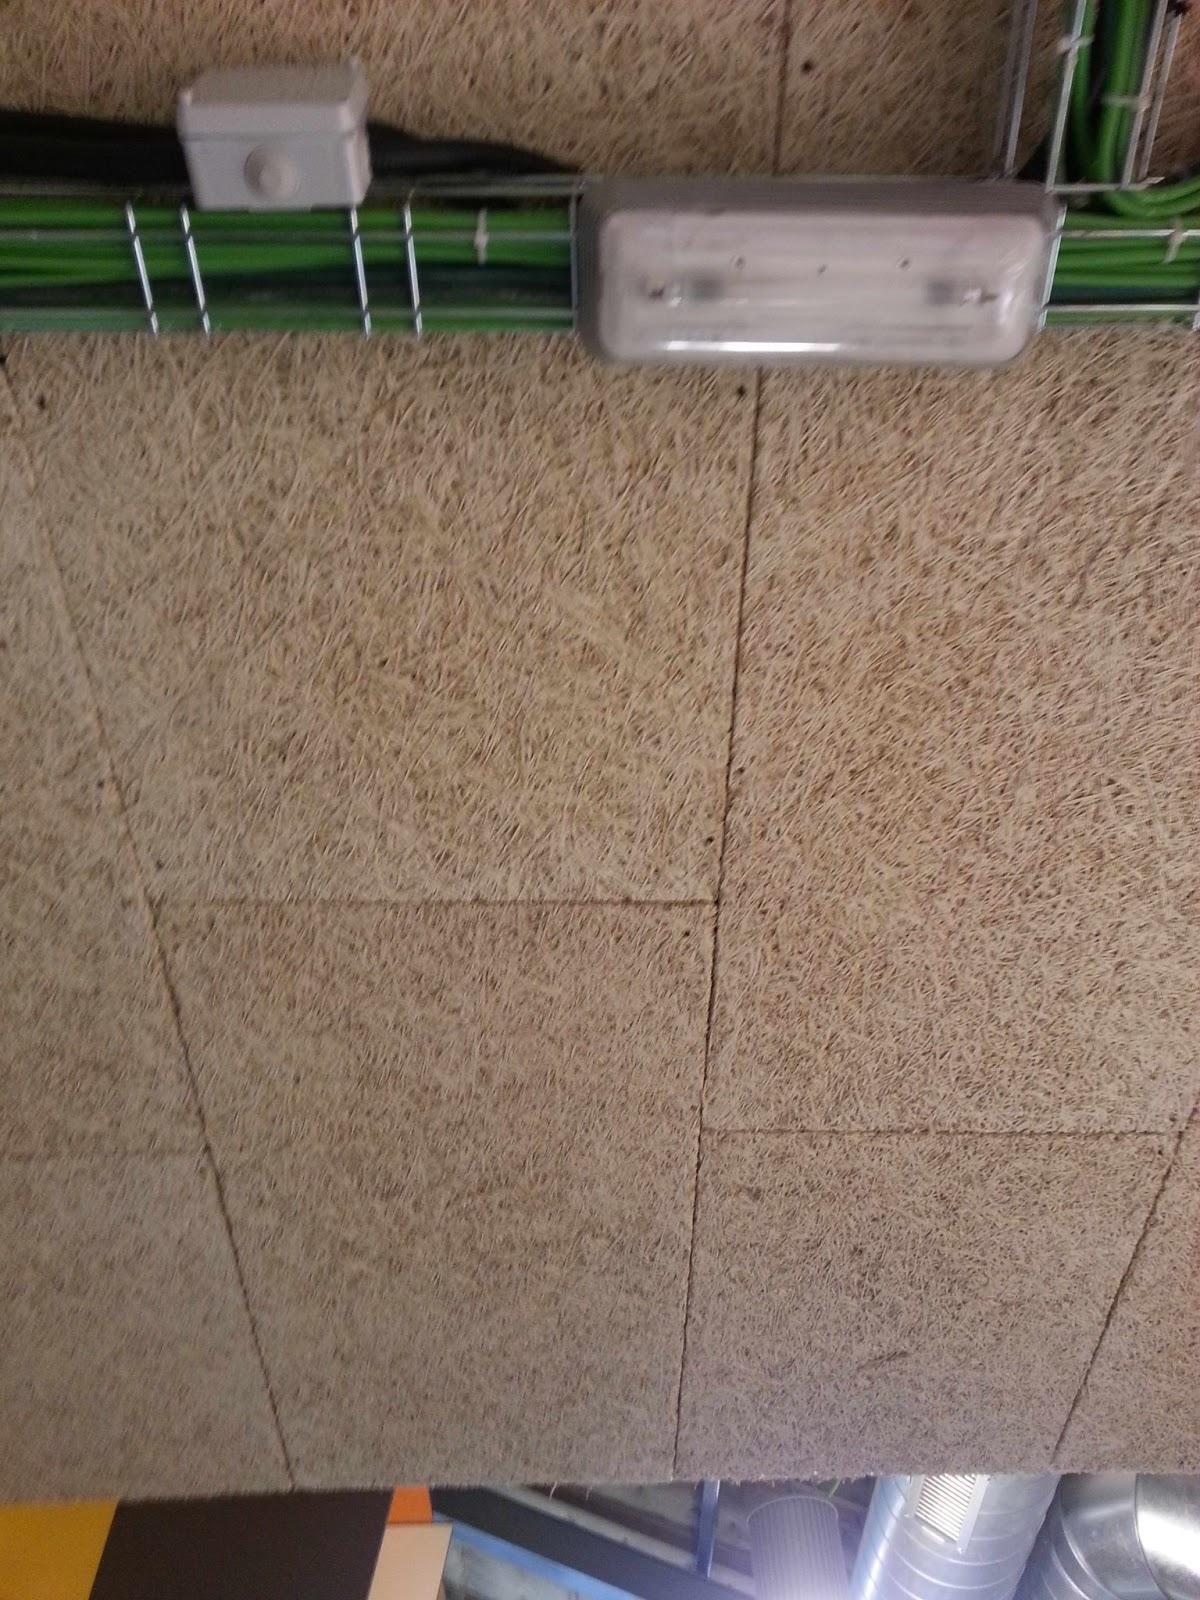 Aislamiento acustico paredes interiores - Aislante para paredes ...